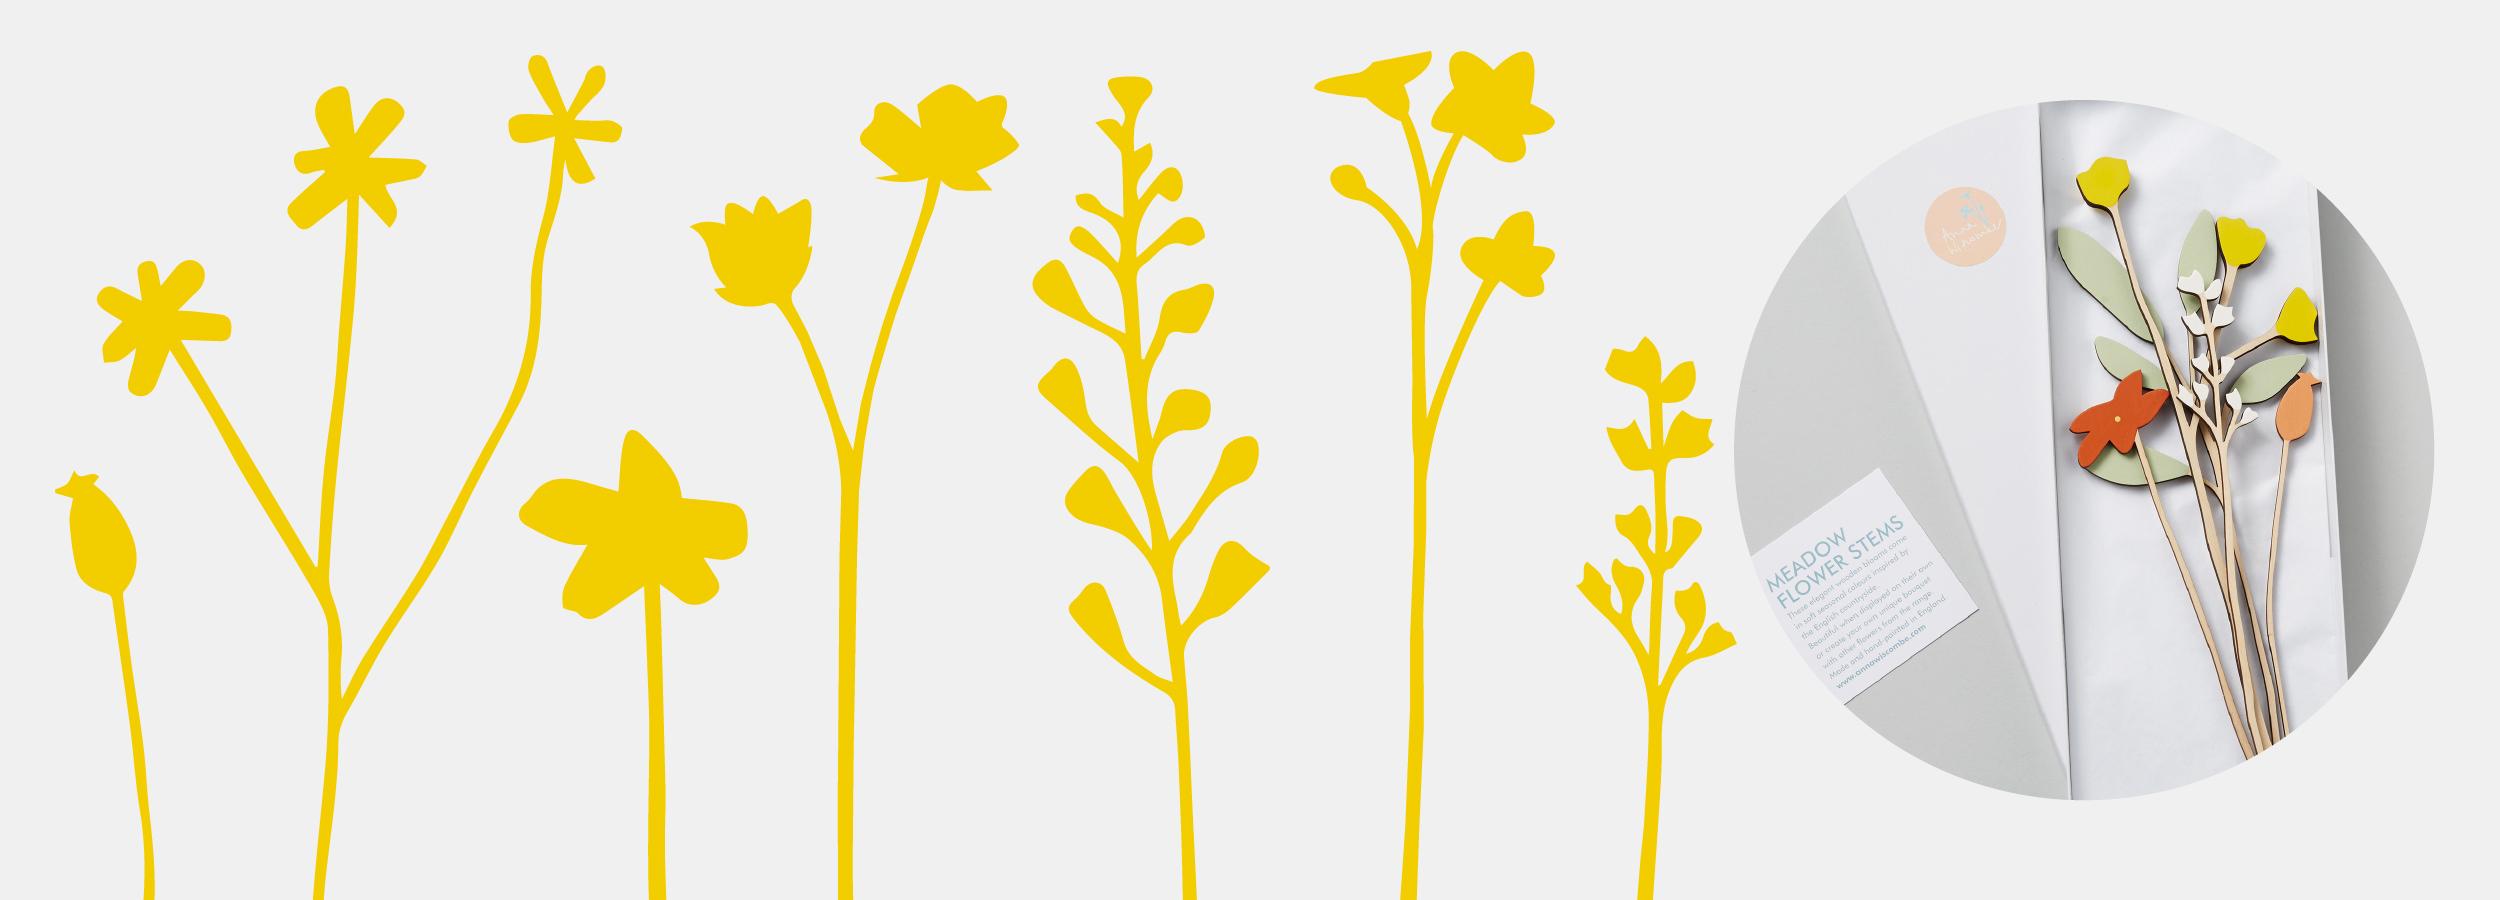 Anna_Wiscombe_Wooden_Wares_Spring_Meadow_Flower_Set_Banner.jpg